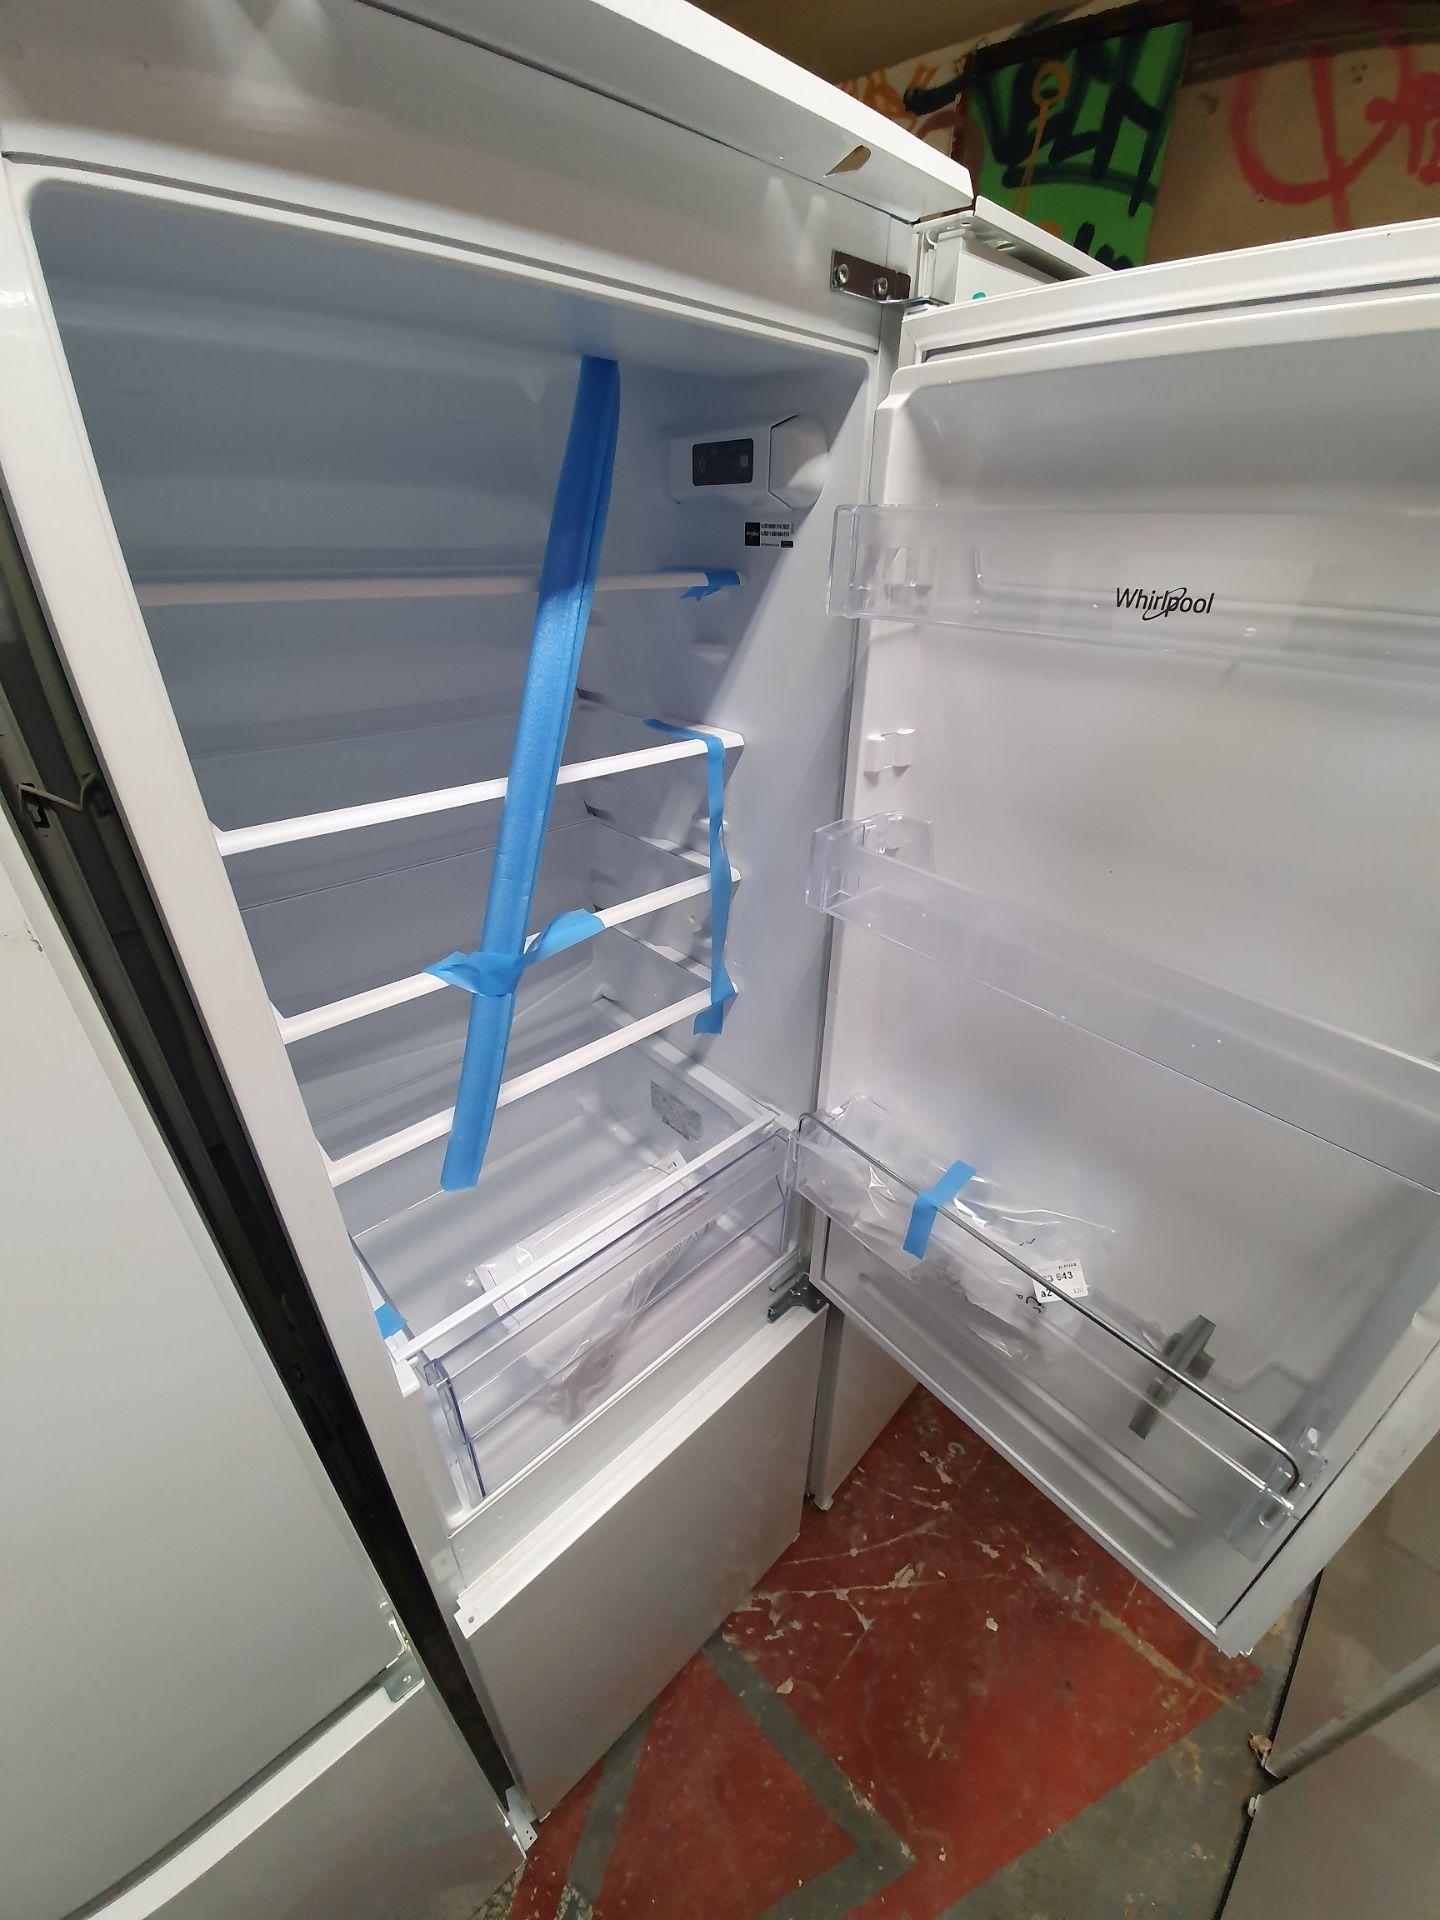 NEW/GRADED AND PACKAGED Zanussi ZBB28441SV Integrated 70/30 Fridge Freezer (Slight external damage) - Image 10 of 14